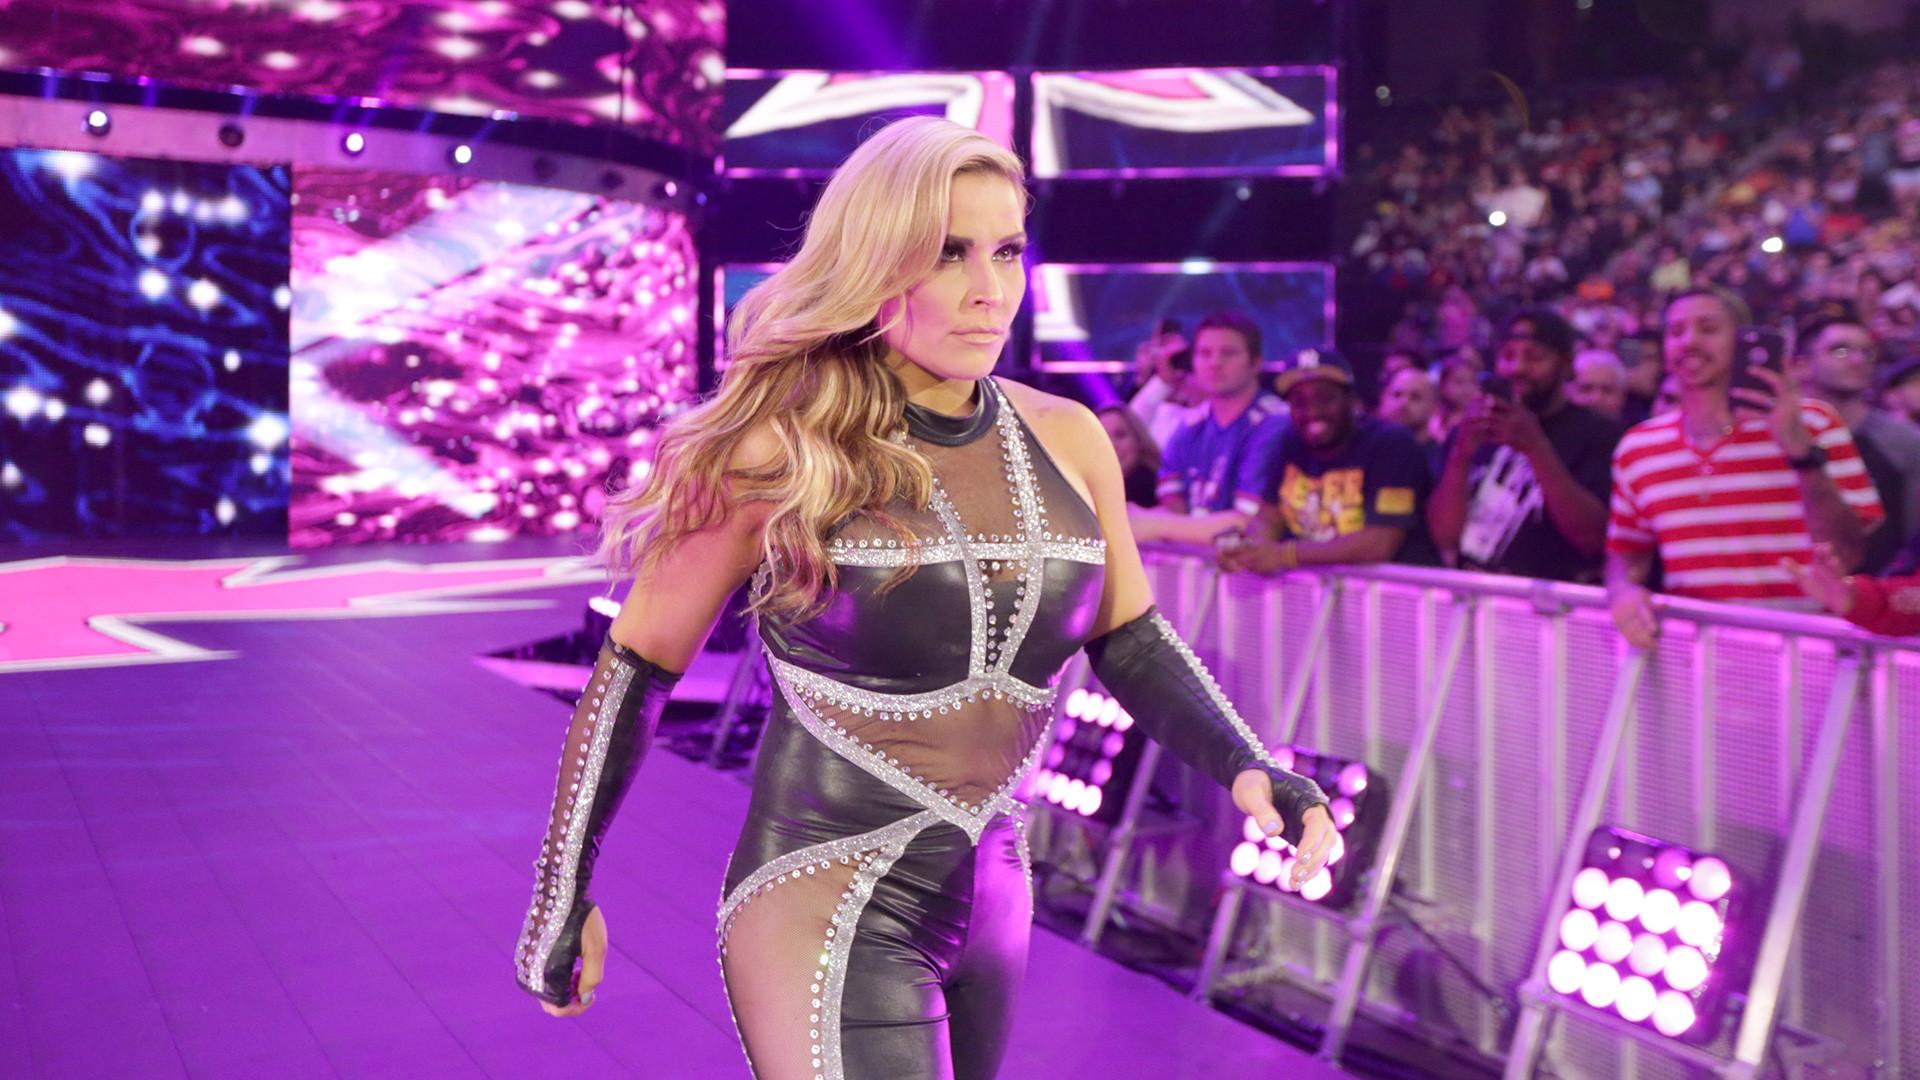 Natalya HD Images 8 #NatalyaHDImages #Natalya #wwe #wrestling #divas # wwedivas